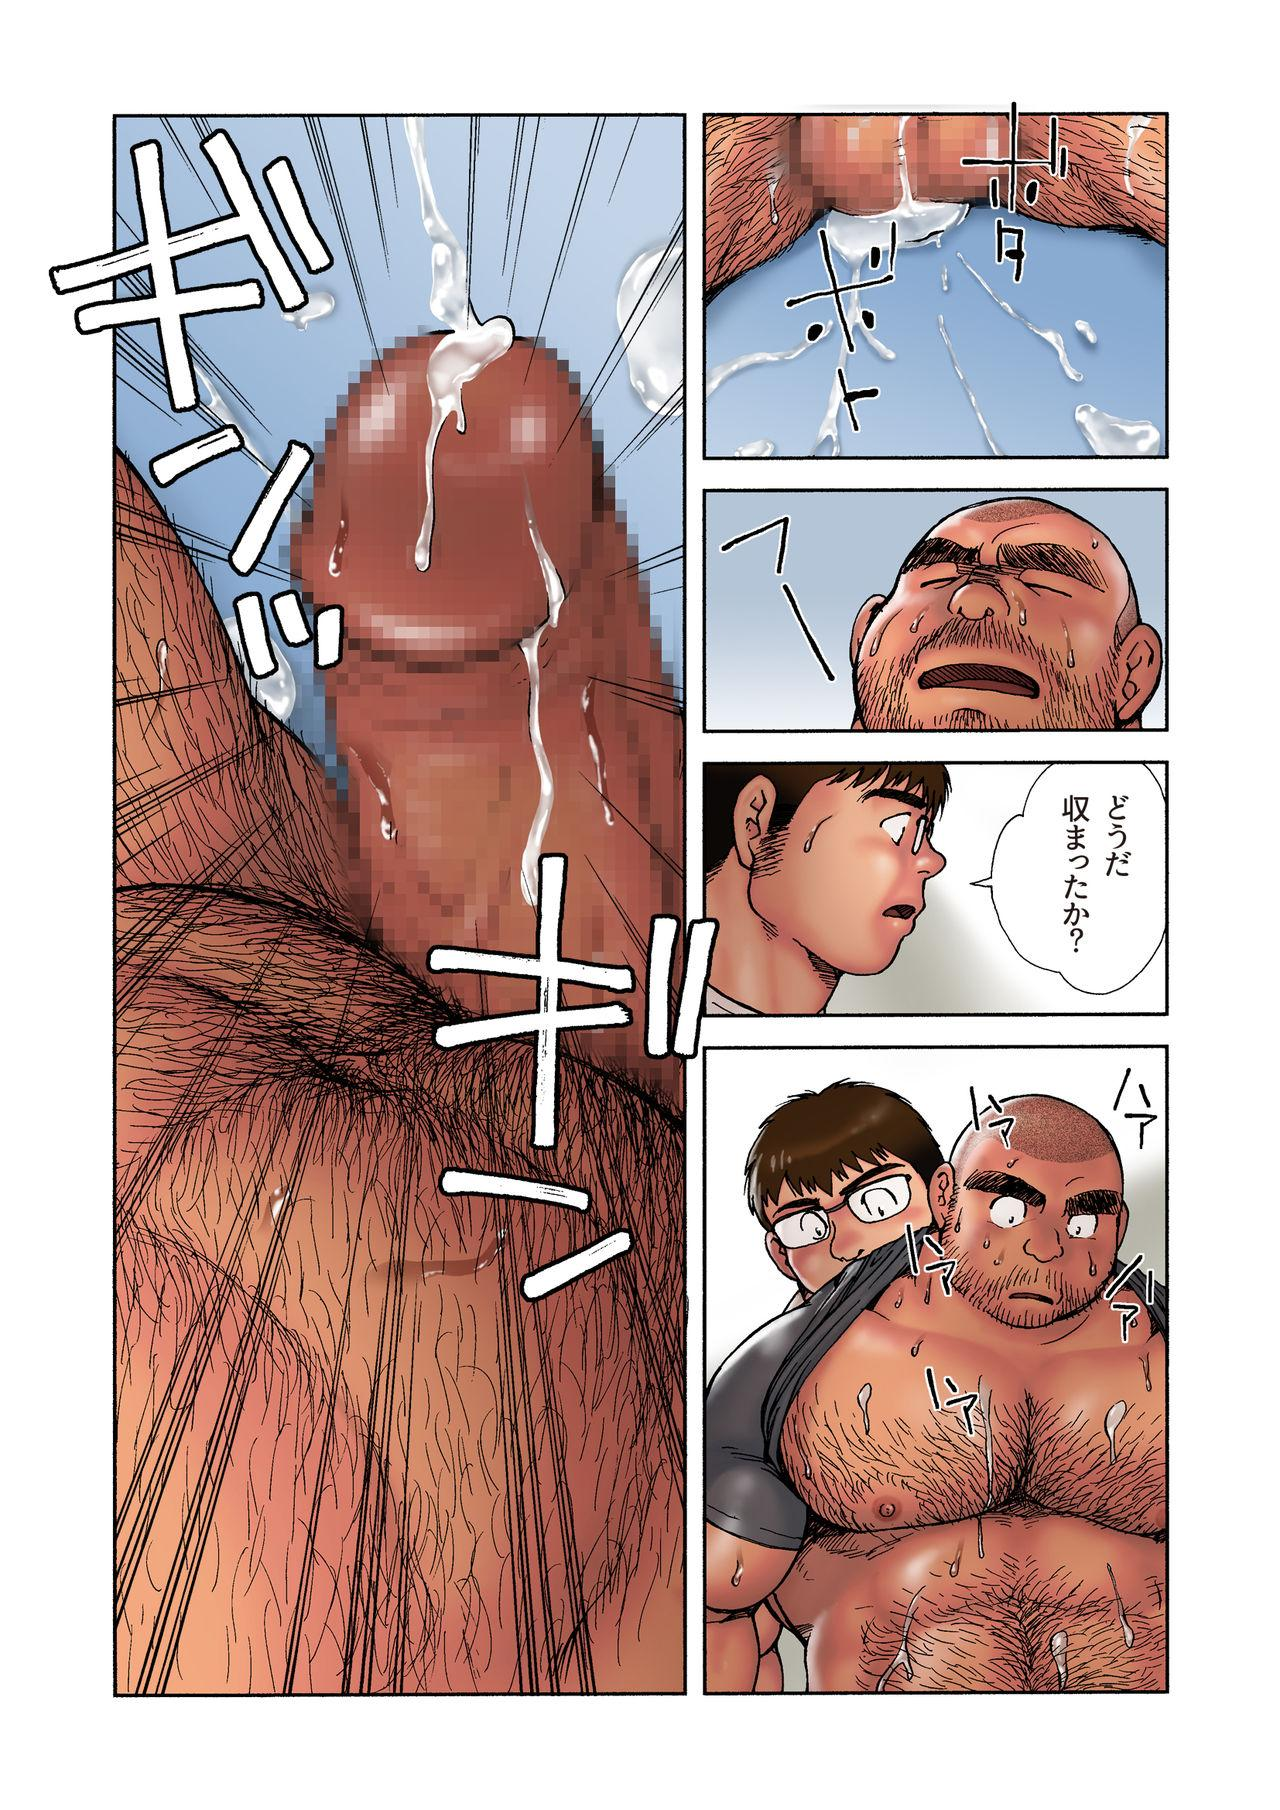 Danshi Koukousei Weightlifter Shiai-chuu, Osae kirenai Wakai Takeri 46